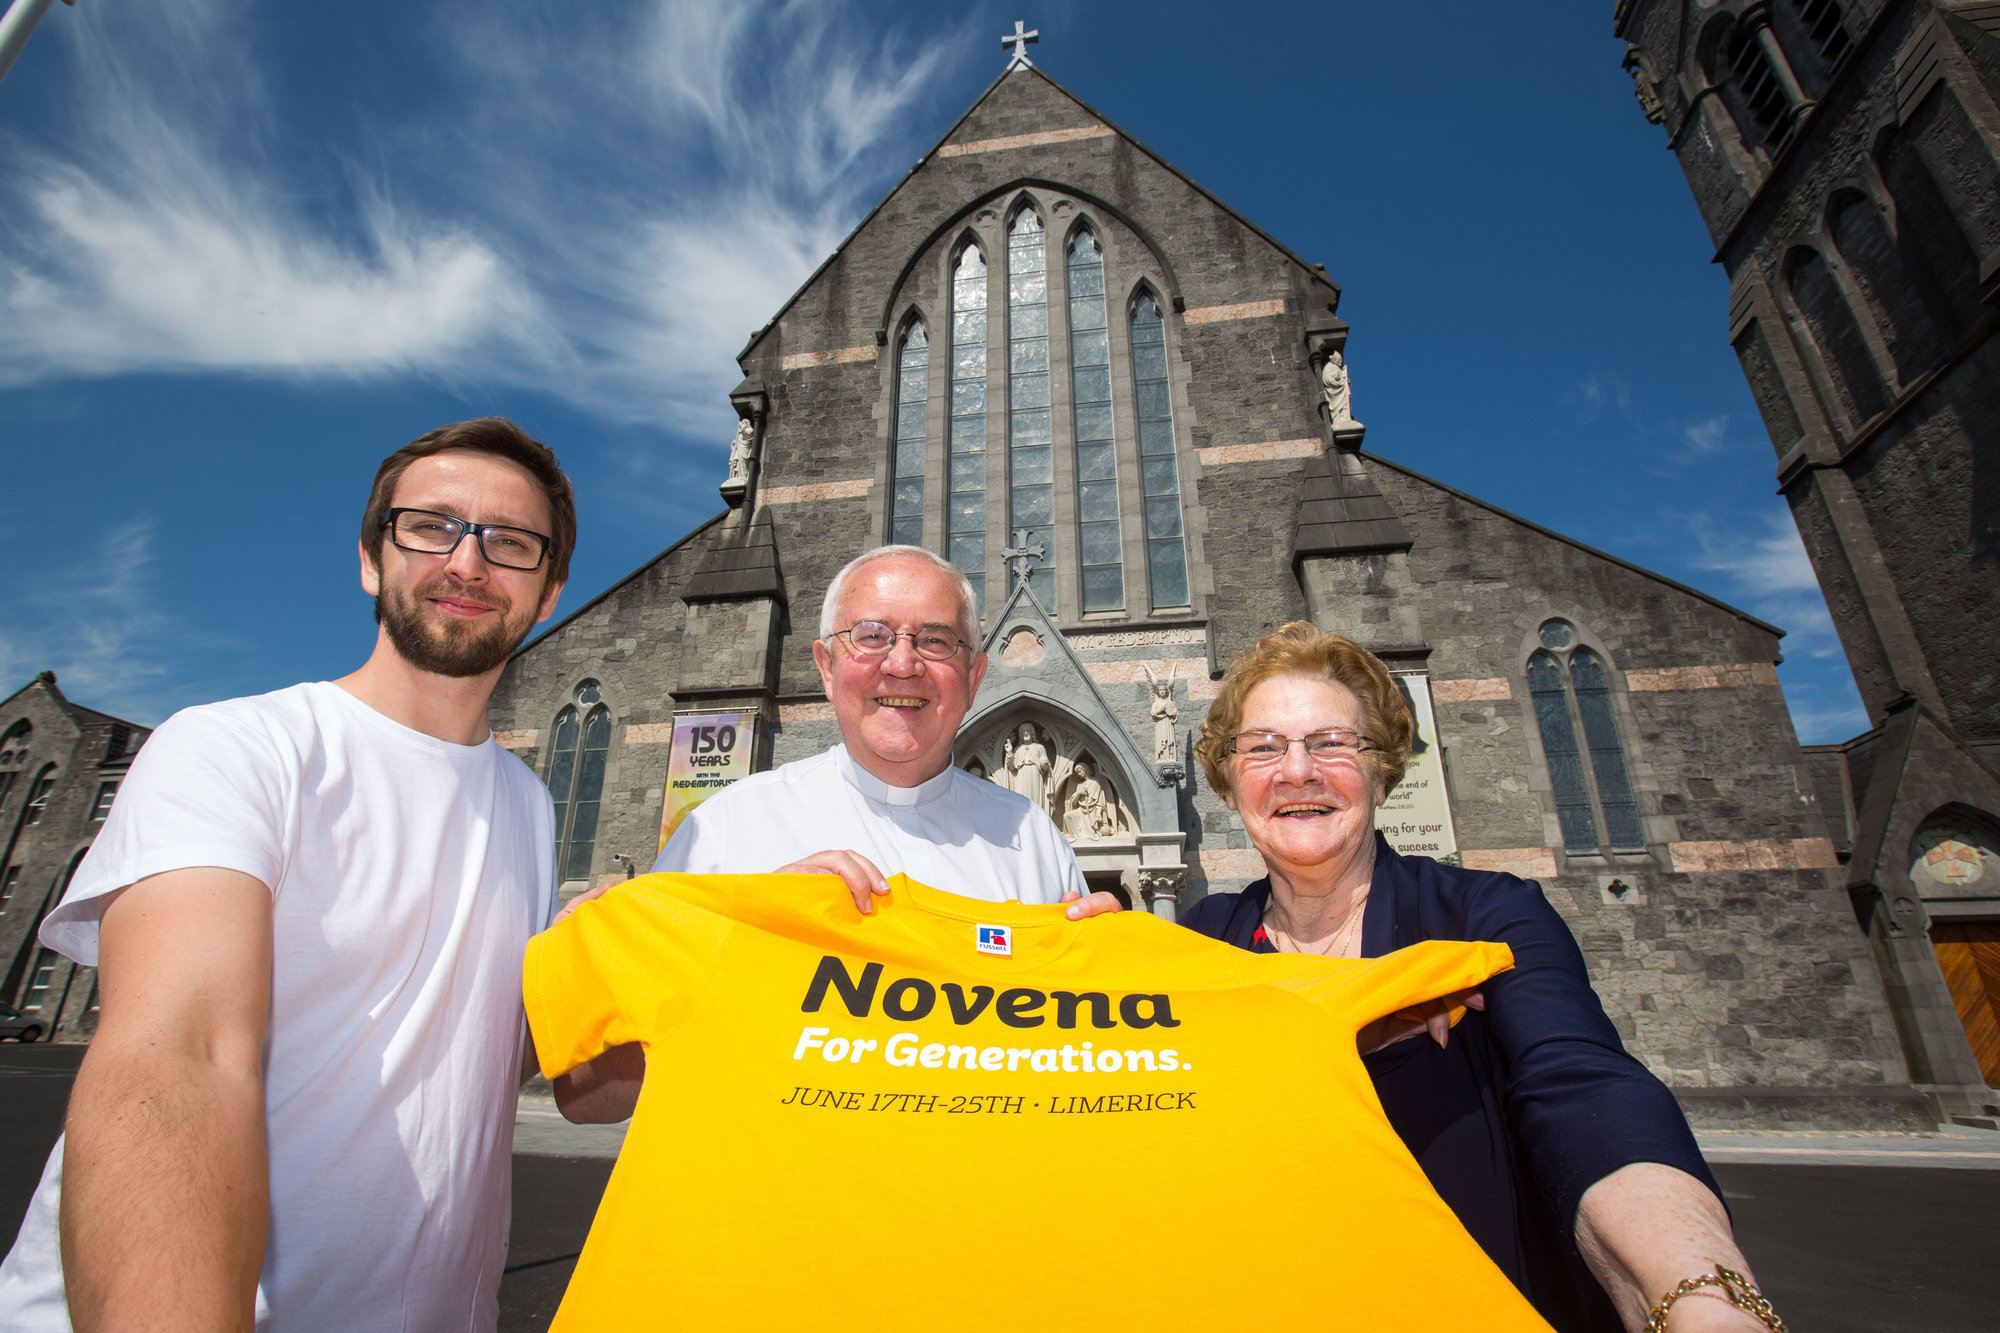 Limerick Novena 2016 celebrating 150 years of devotion